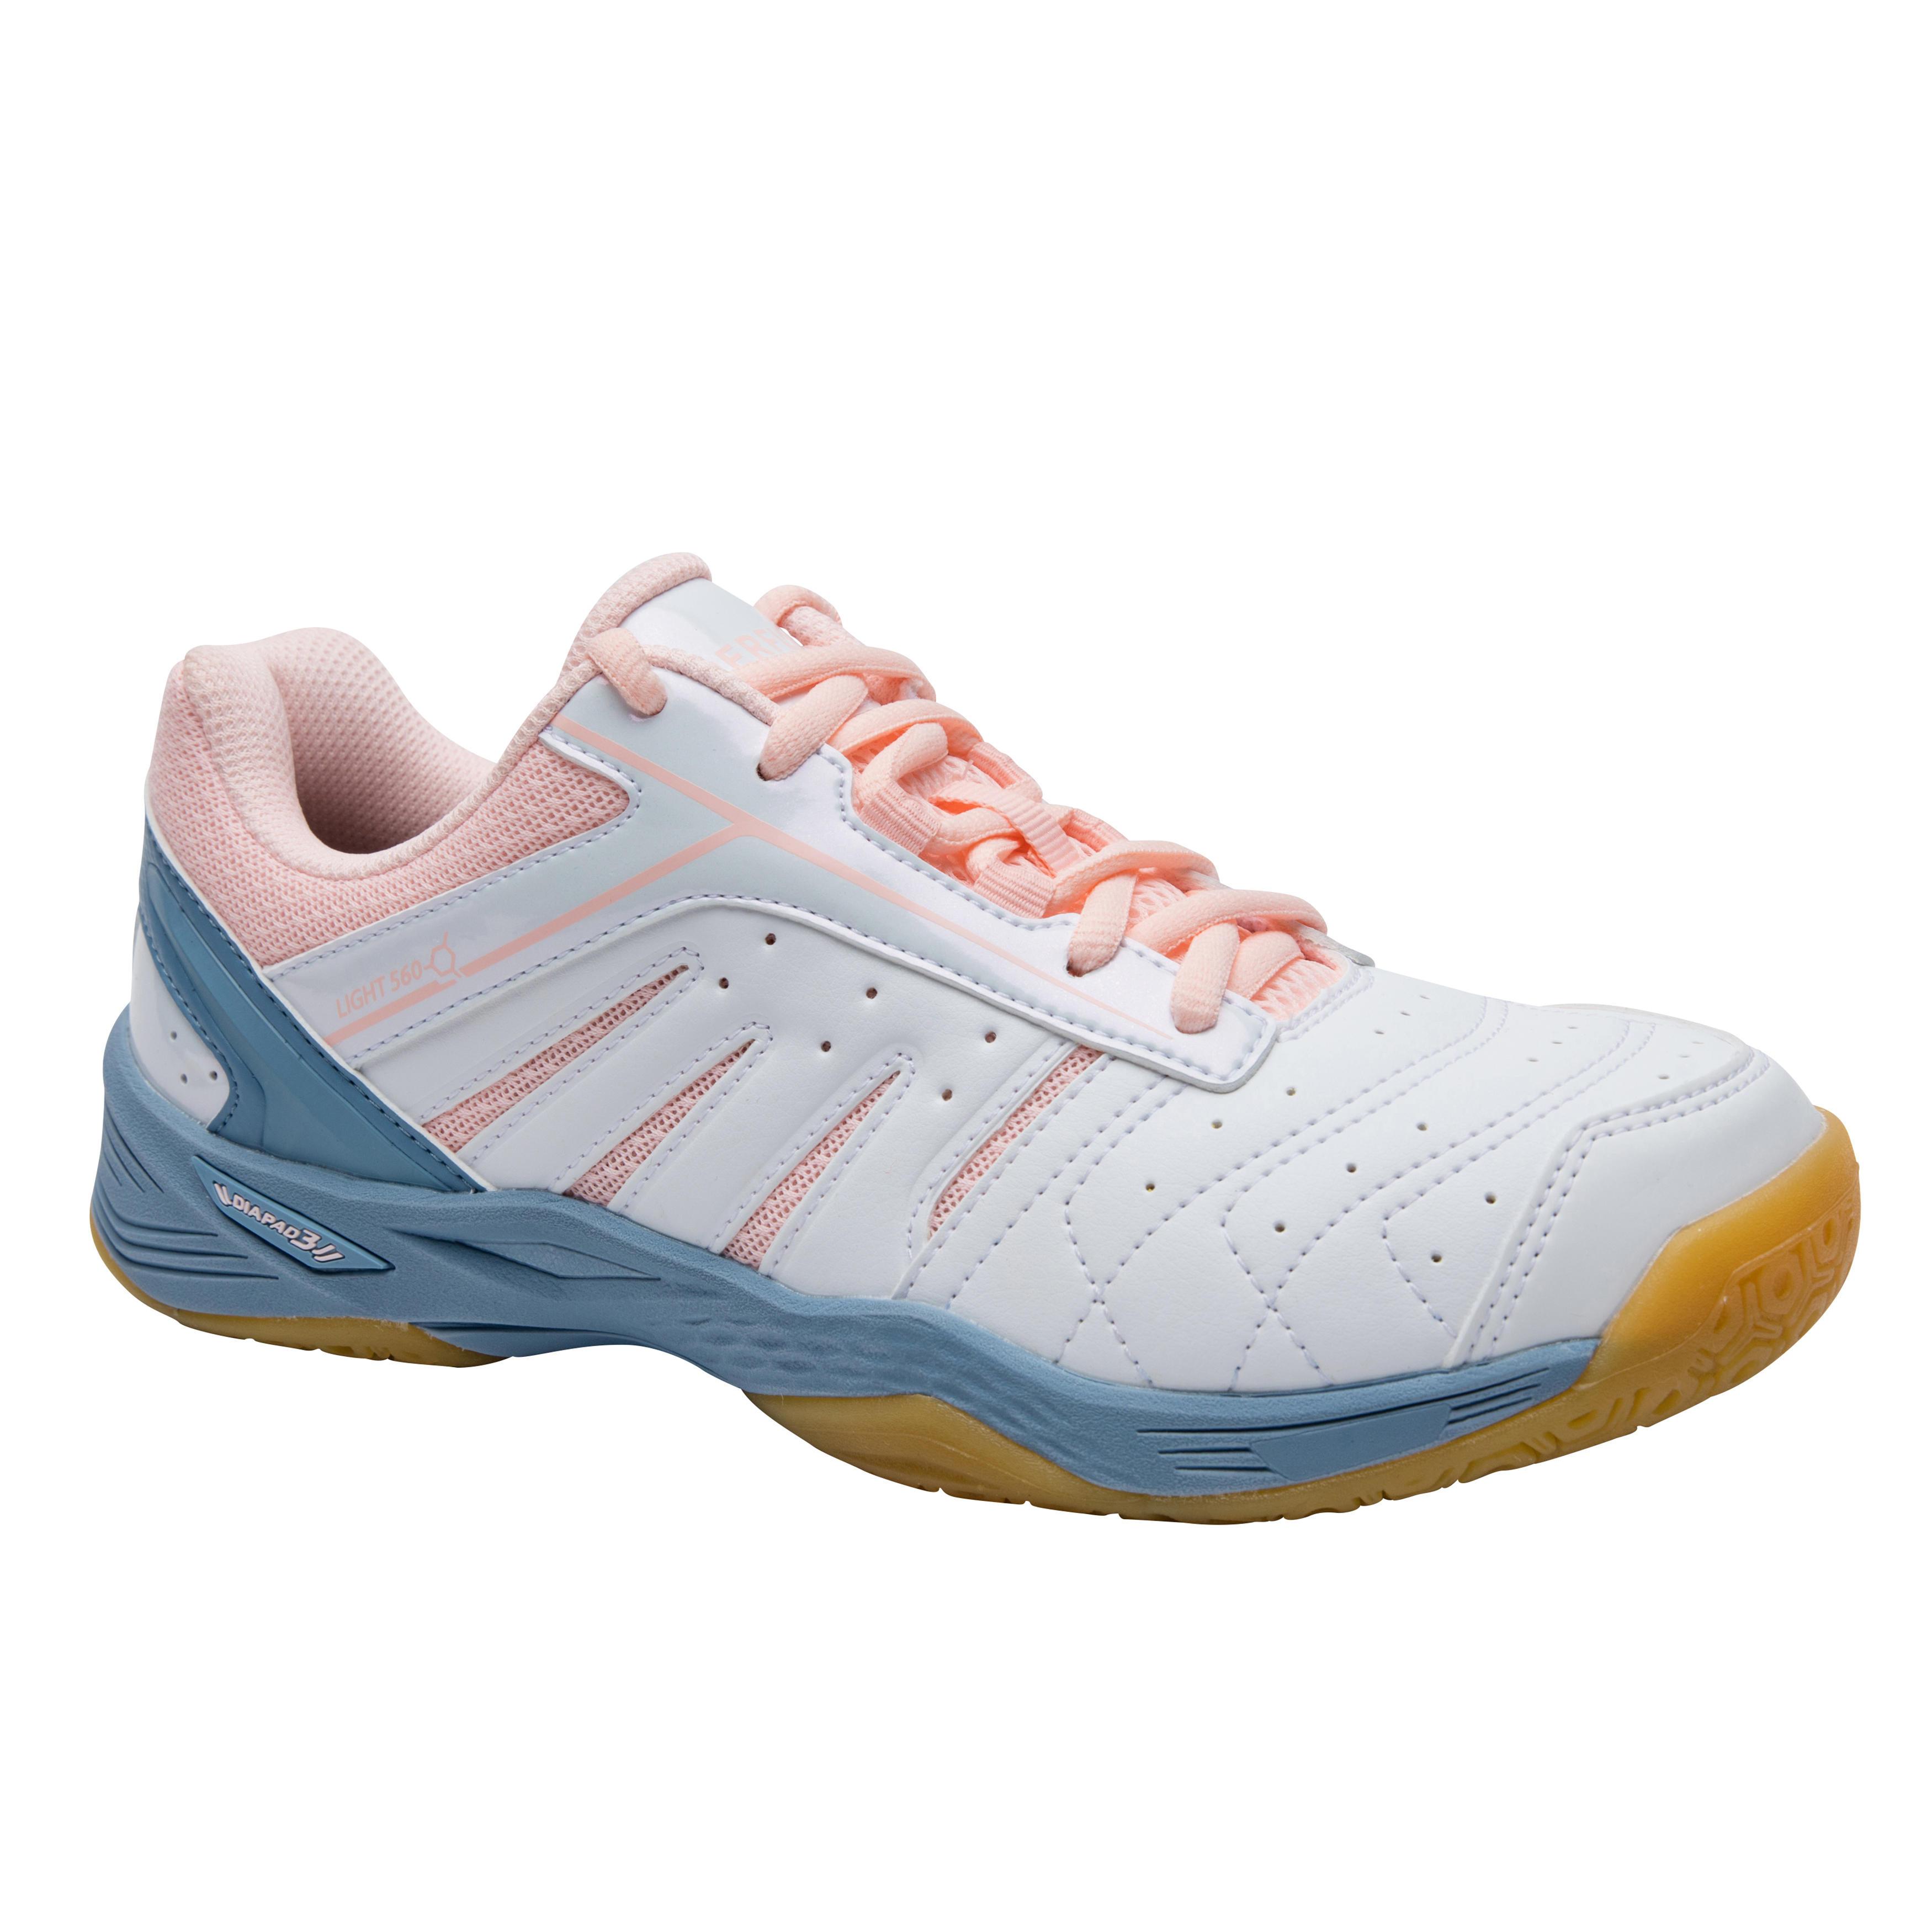 5faa3cc853a Squash schoenen kopen? | Decathlon.nl